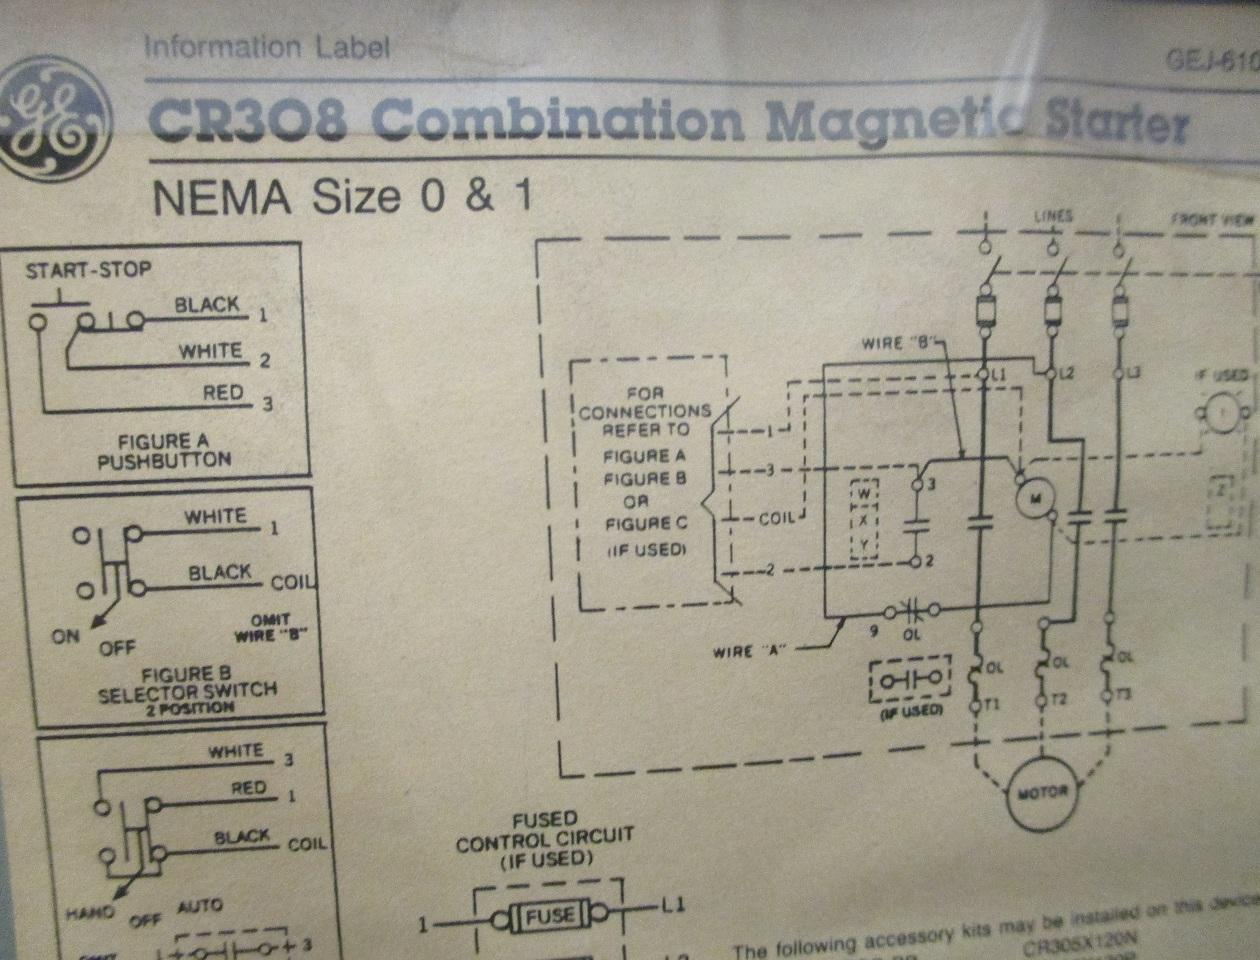 dis3585 ge combination magnetic starter cr308 600v max complete enclosure 300 line control 3?resize\\\=665%2C507 camden door controls cm 30e led c u pte wiring diagram,door \u2022 j ge cr306 magnetic starter wiring diagram at readyjetset.co